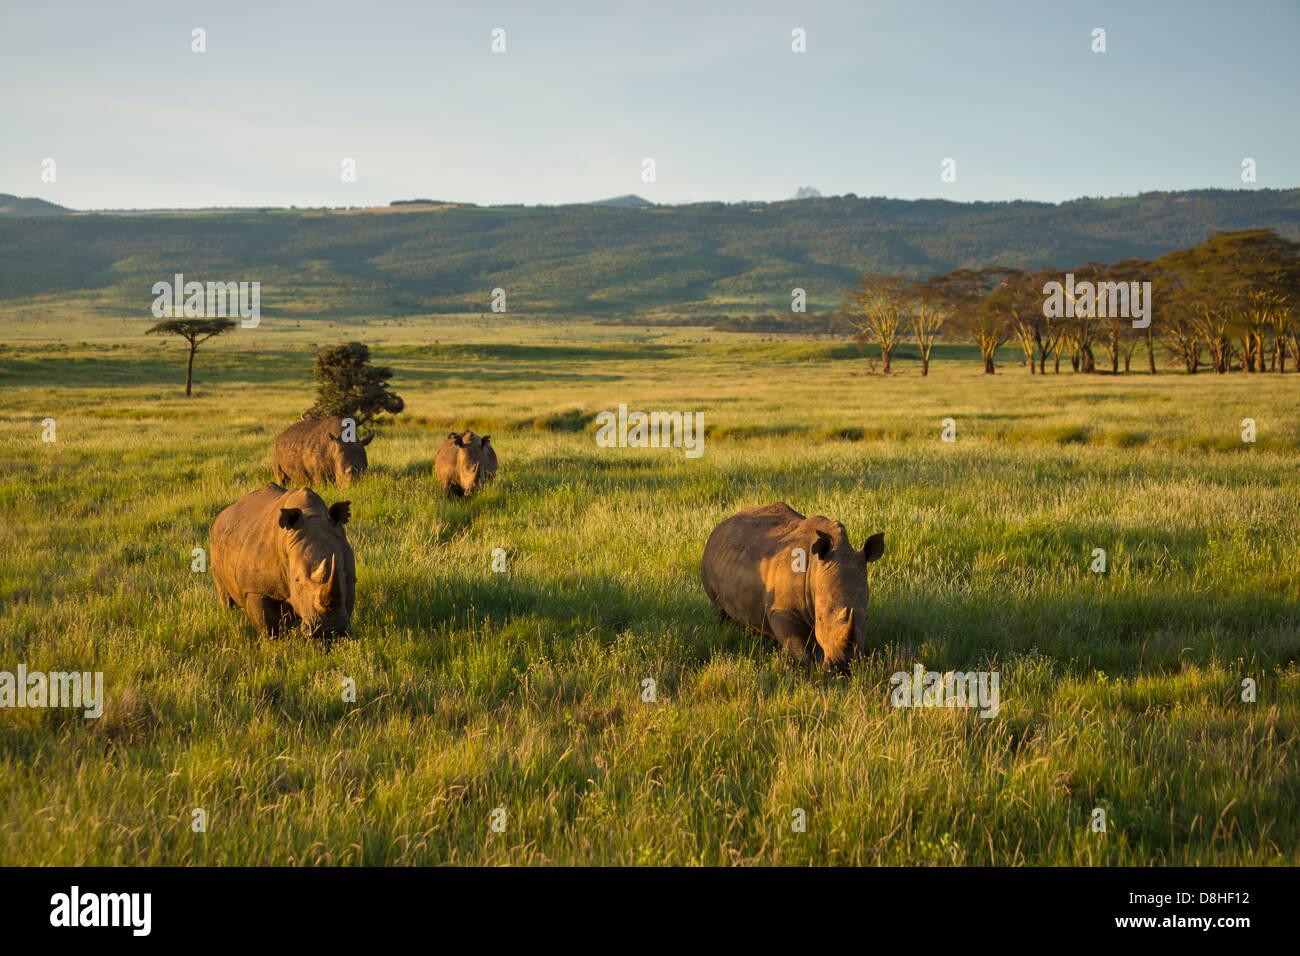 White Rhinoceros (Ceratotherium simum). Kenya - Stock Image